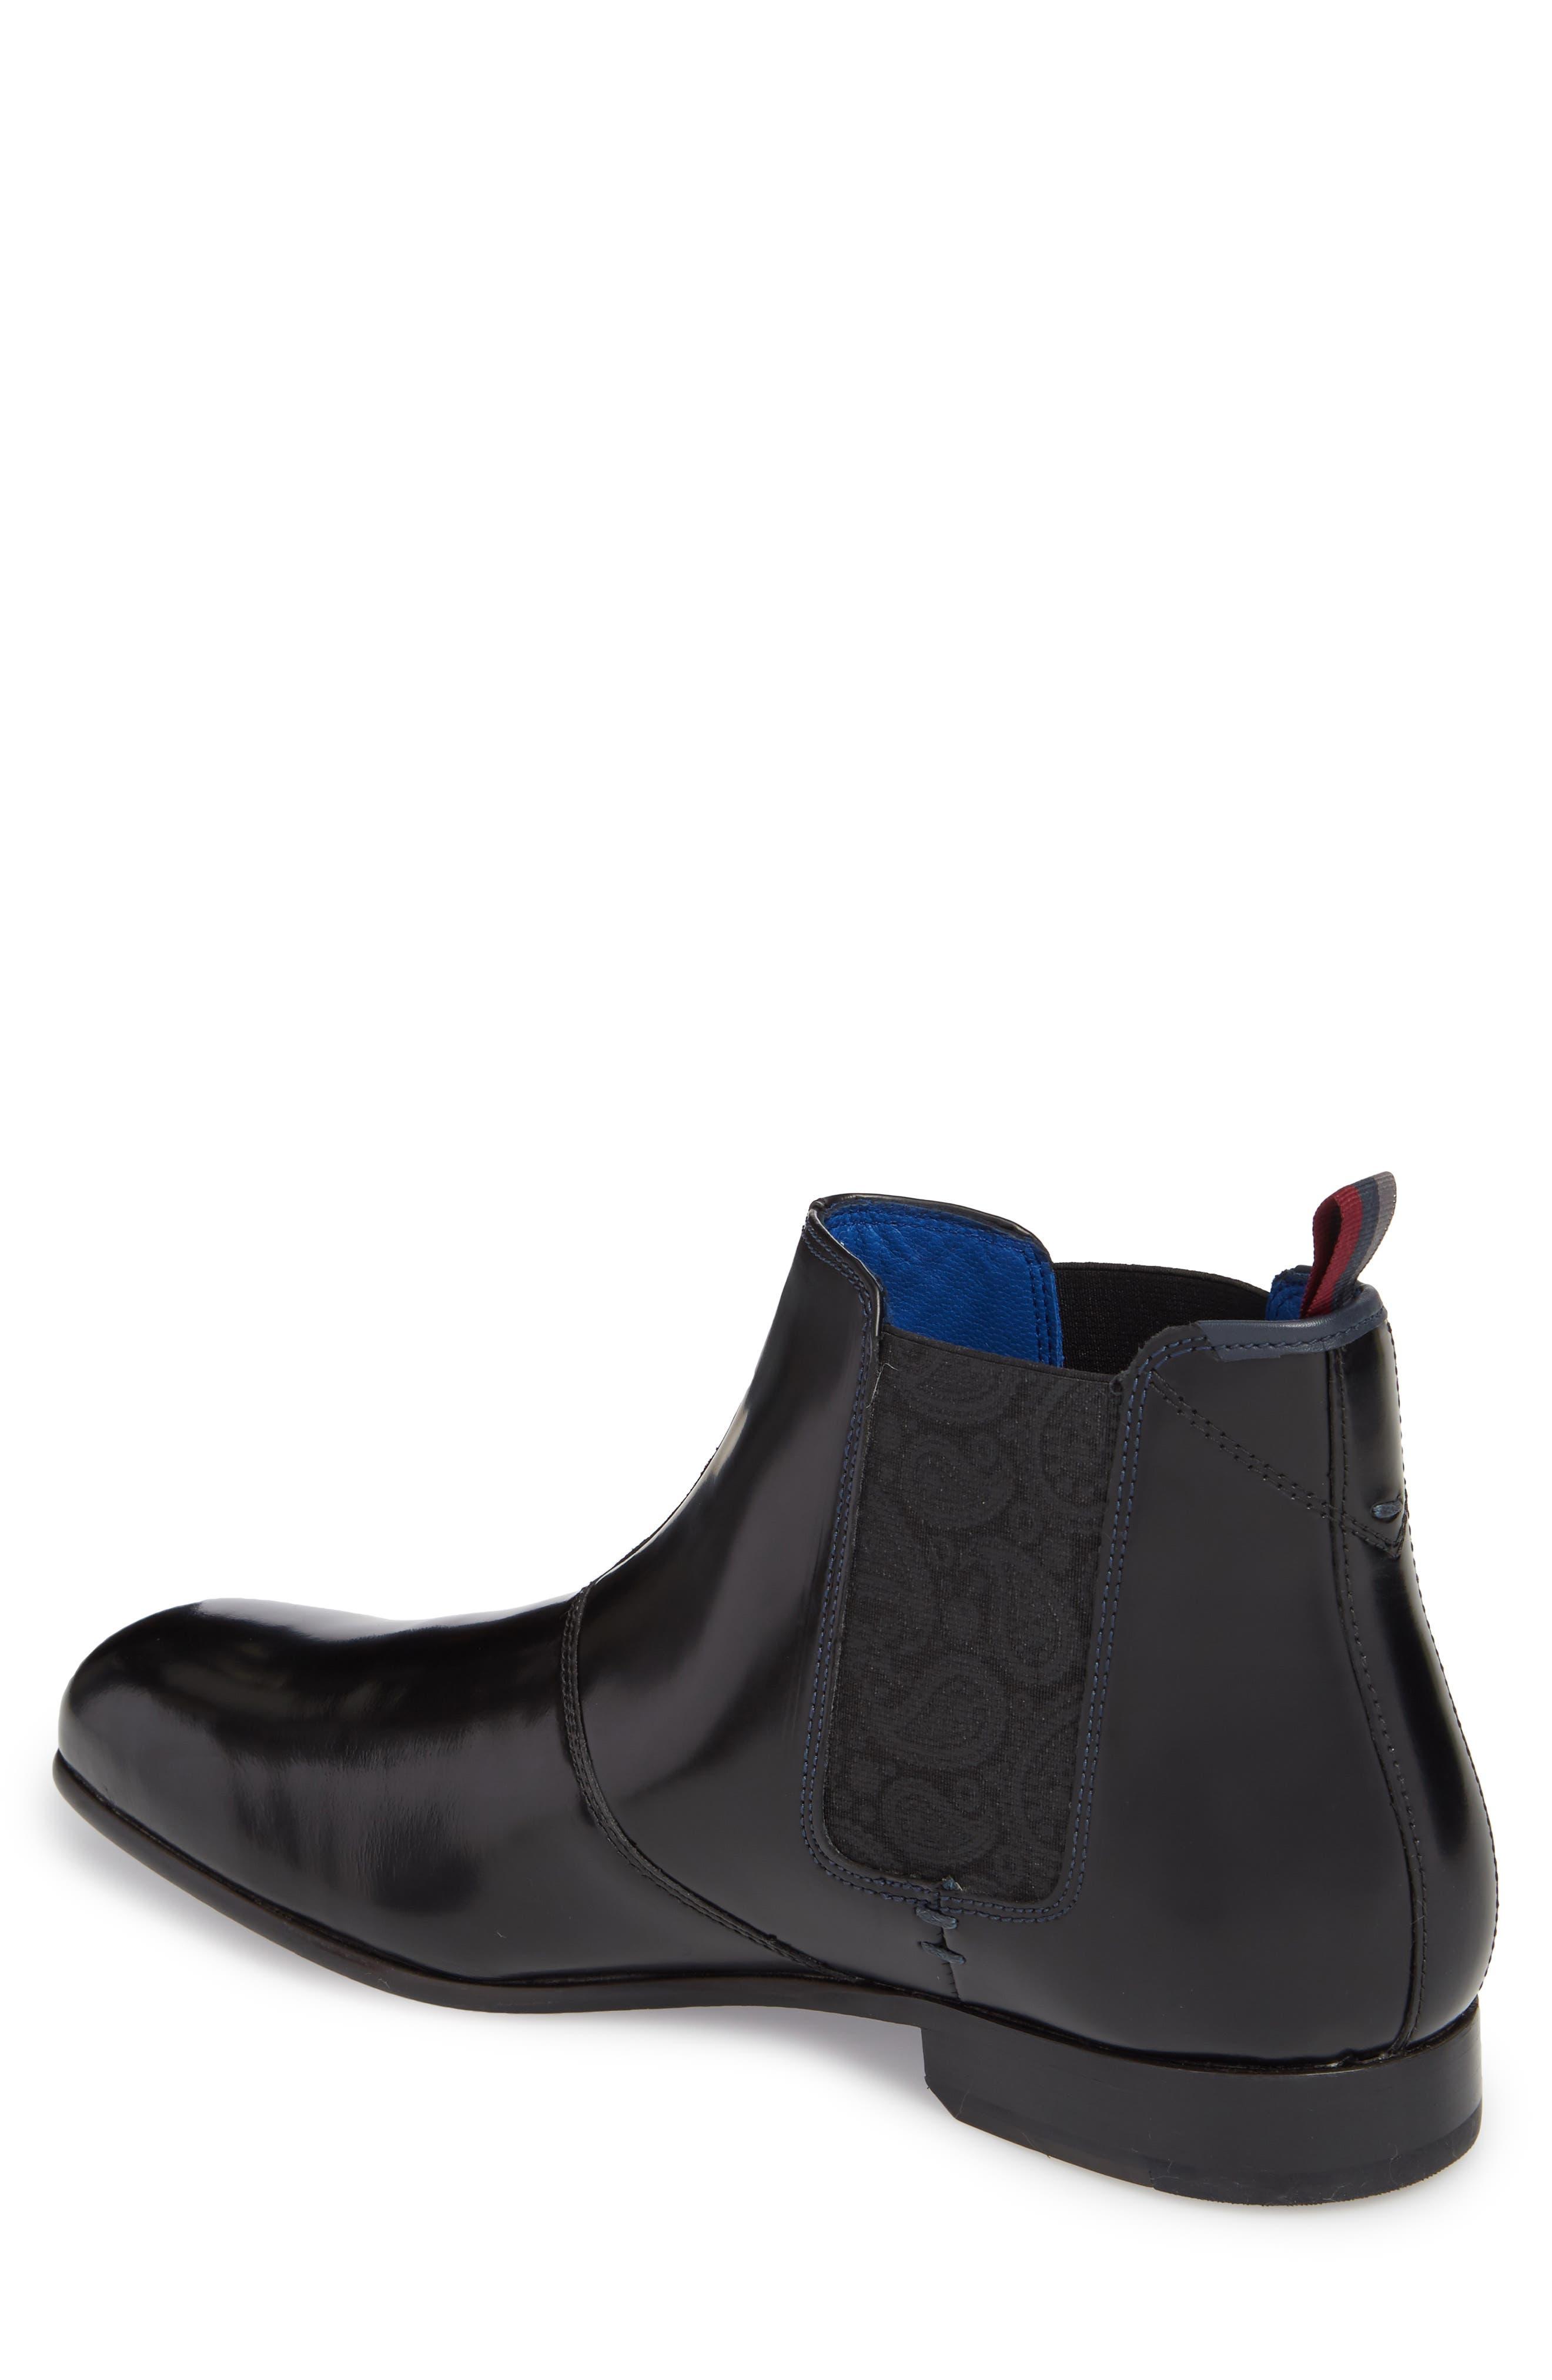 Auldham Chelsea Boot,                             Alternate thumbnail 2, color,                             Black Leather